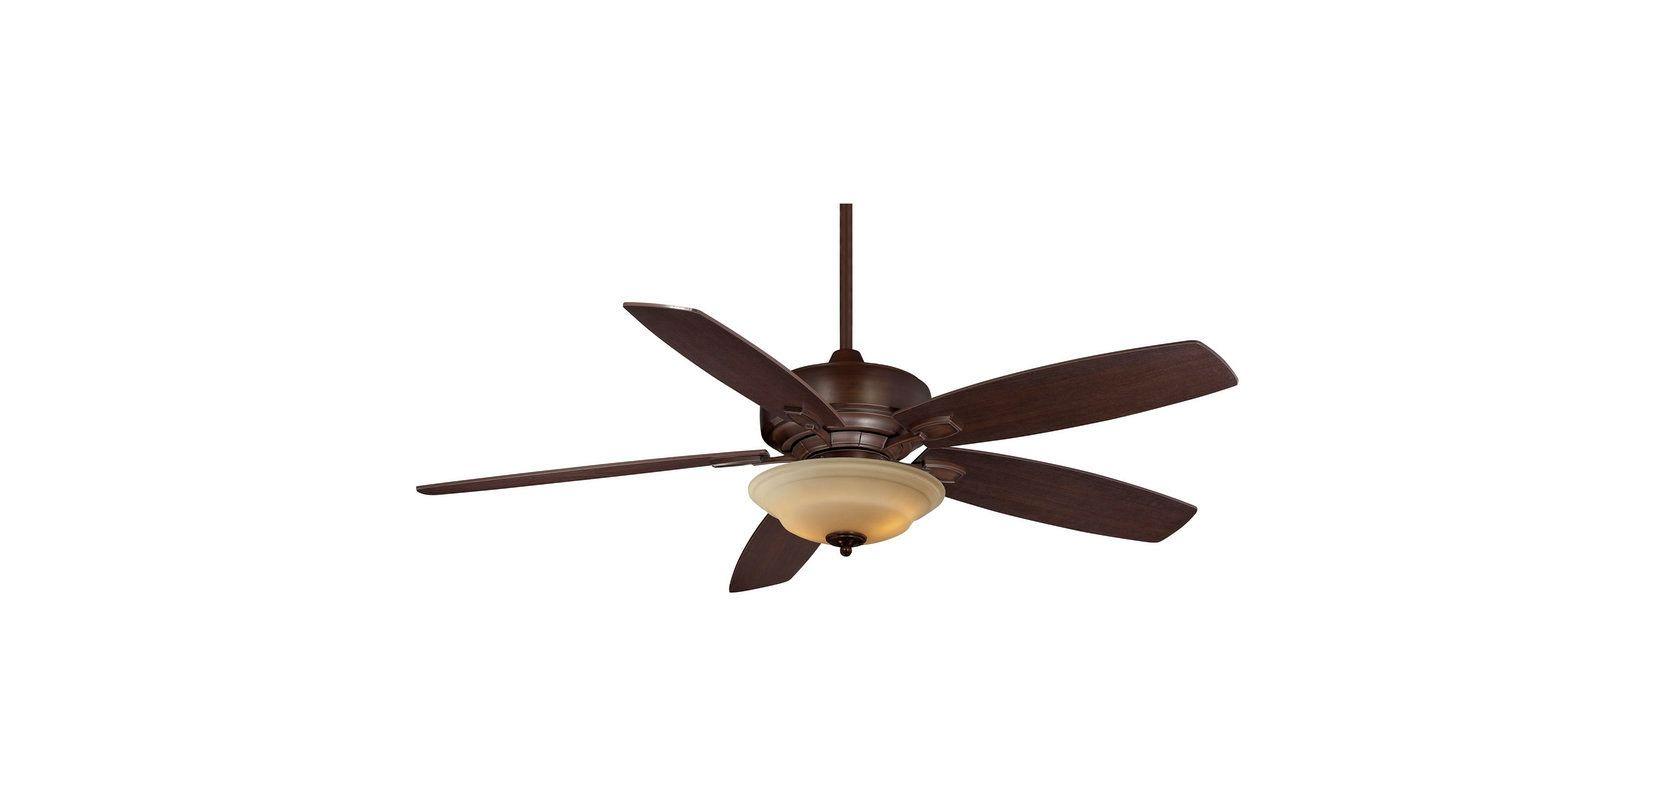 "Savoy House 52-830-5 Wind Star 52"" Span 5 Blade Indoor Ceiling Fan"